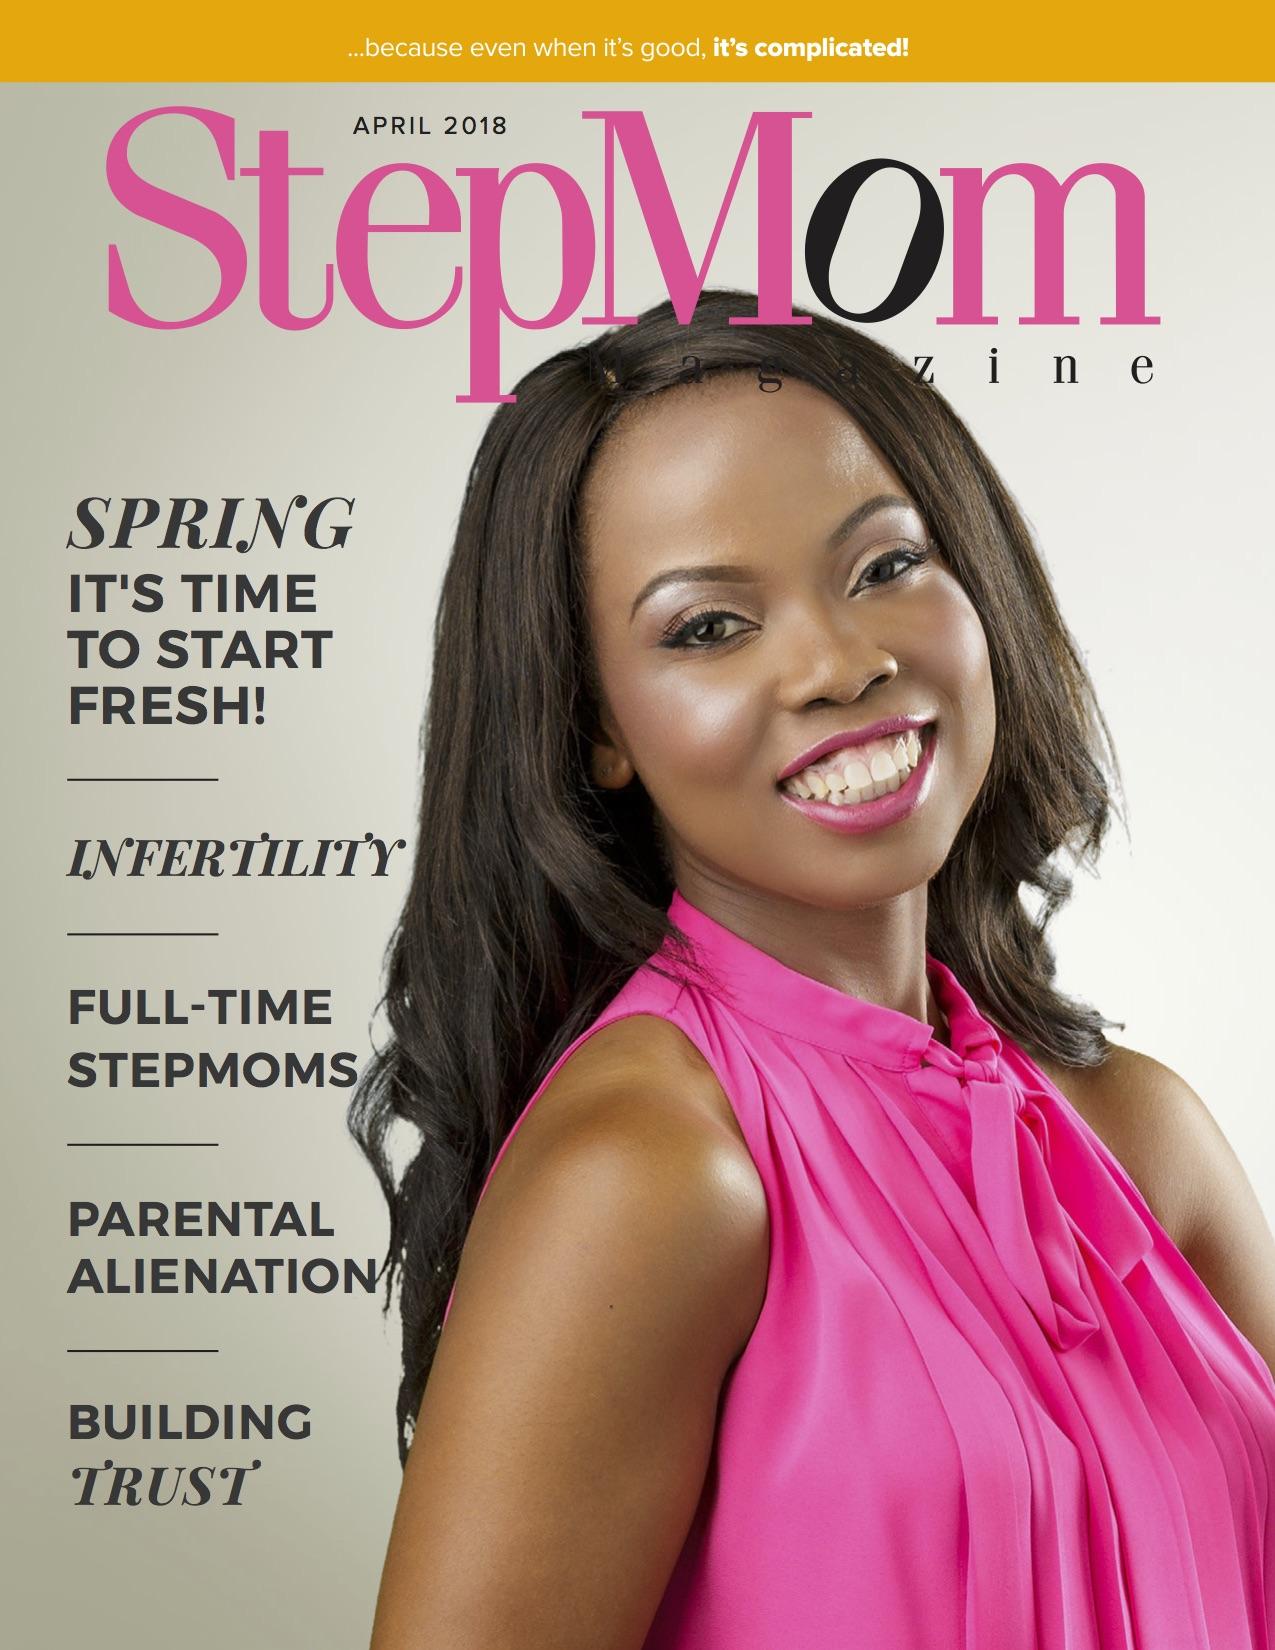 Monthly Online Magazine For Stepmoms